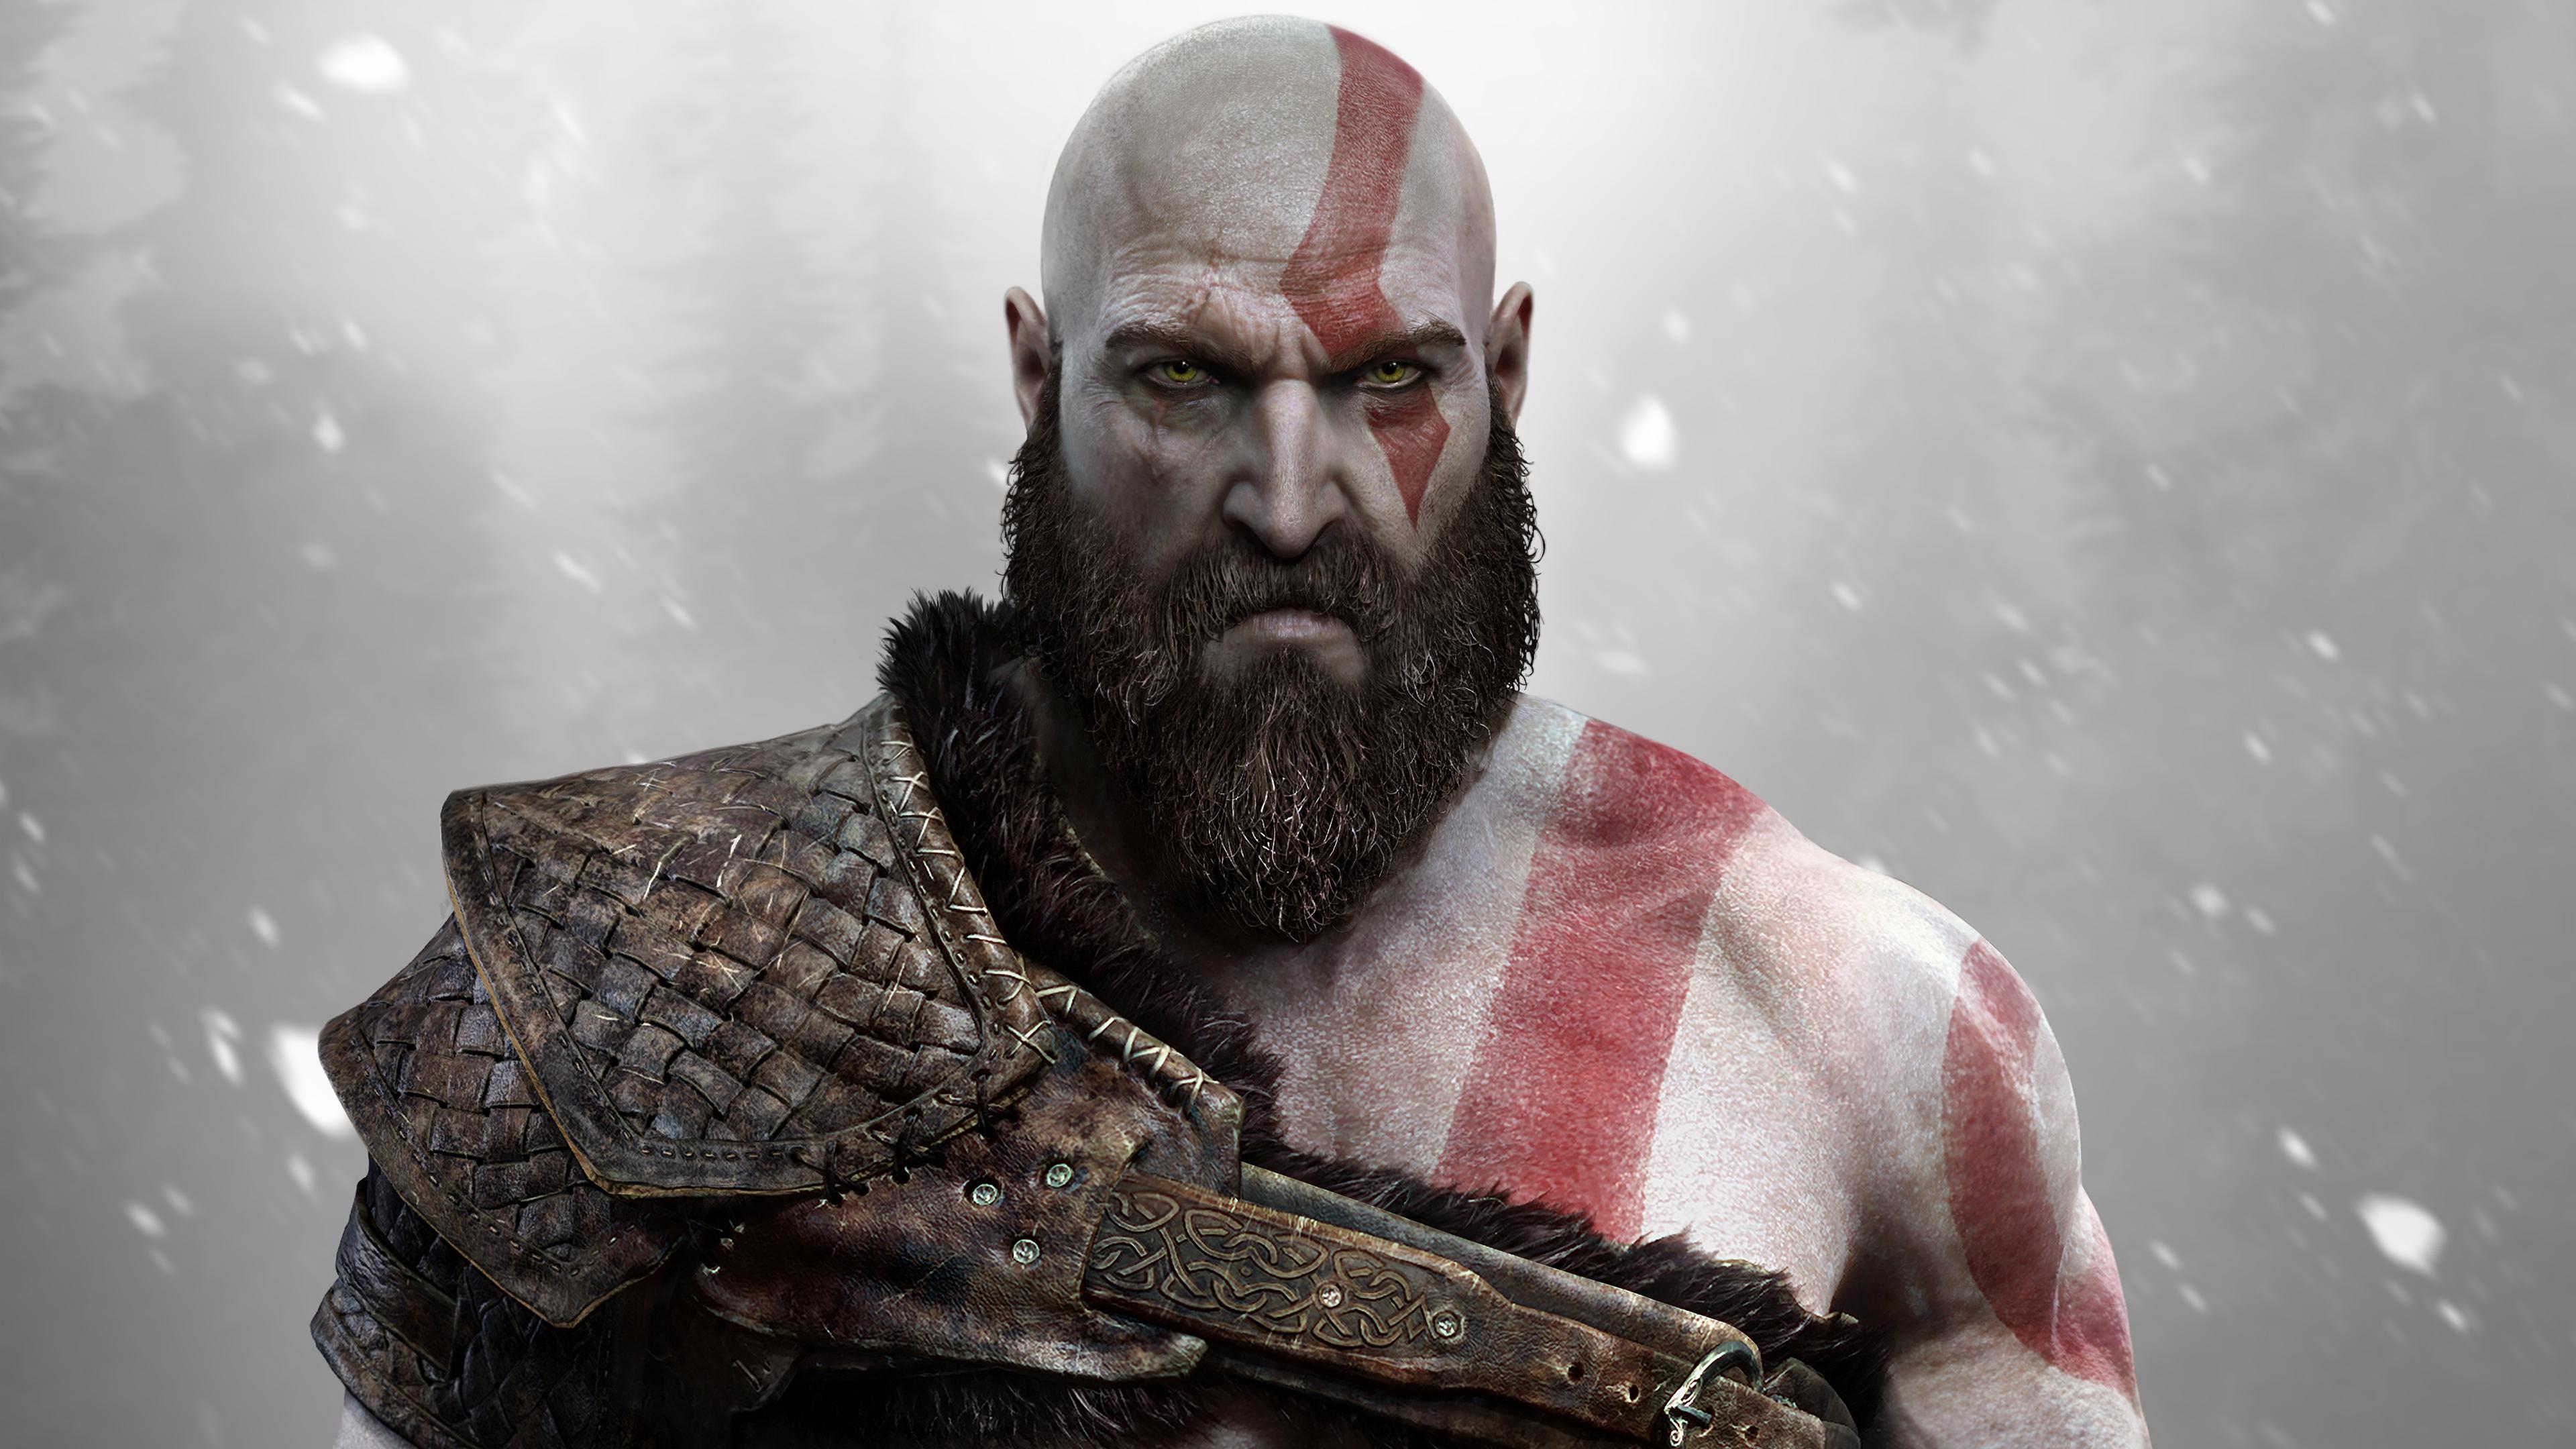 god of war kratos sony santa monica 4k 1538945020 - god of war, kratos, sony santa monica 4k - sony santa monica, Kratos, god of war